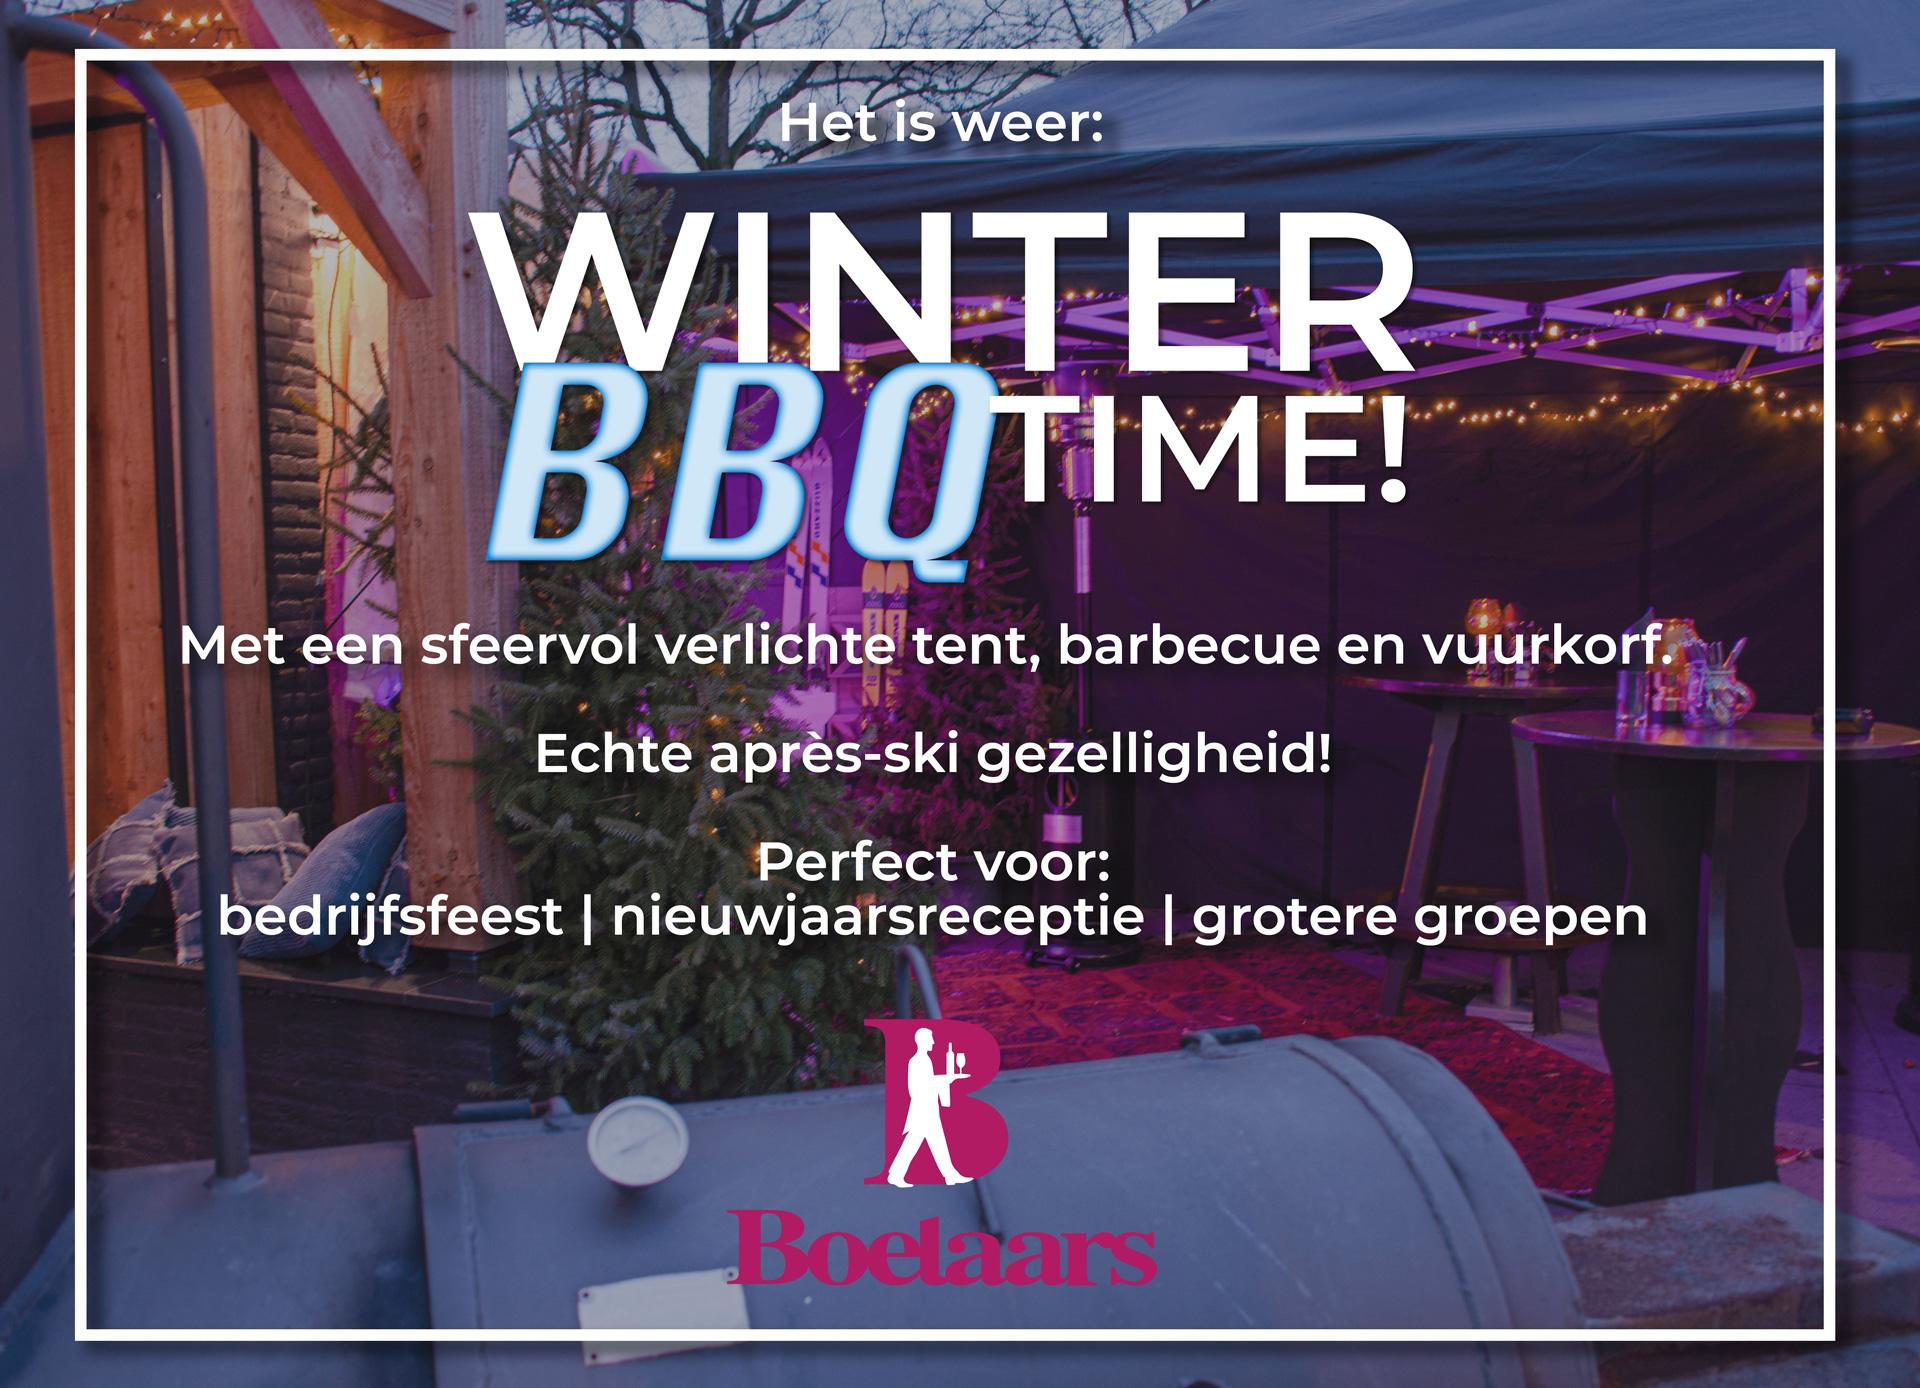 Winter-BBQ-bij-Boelaars-min-web